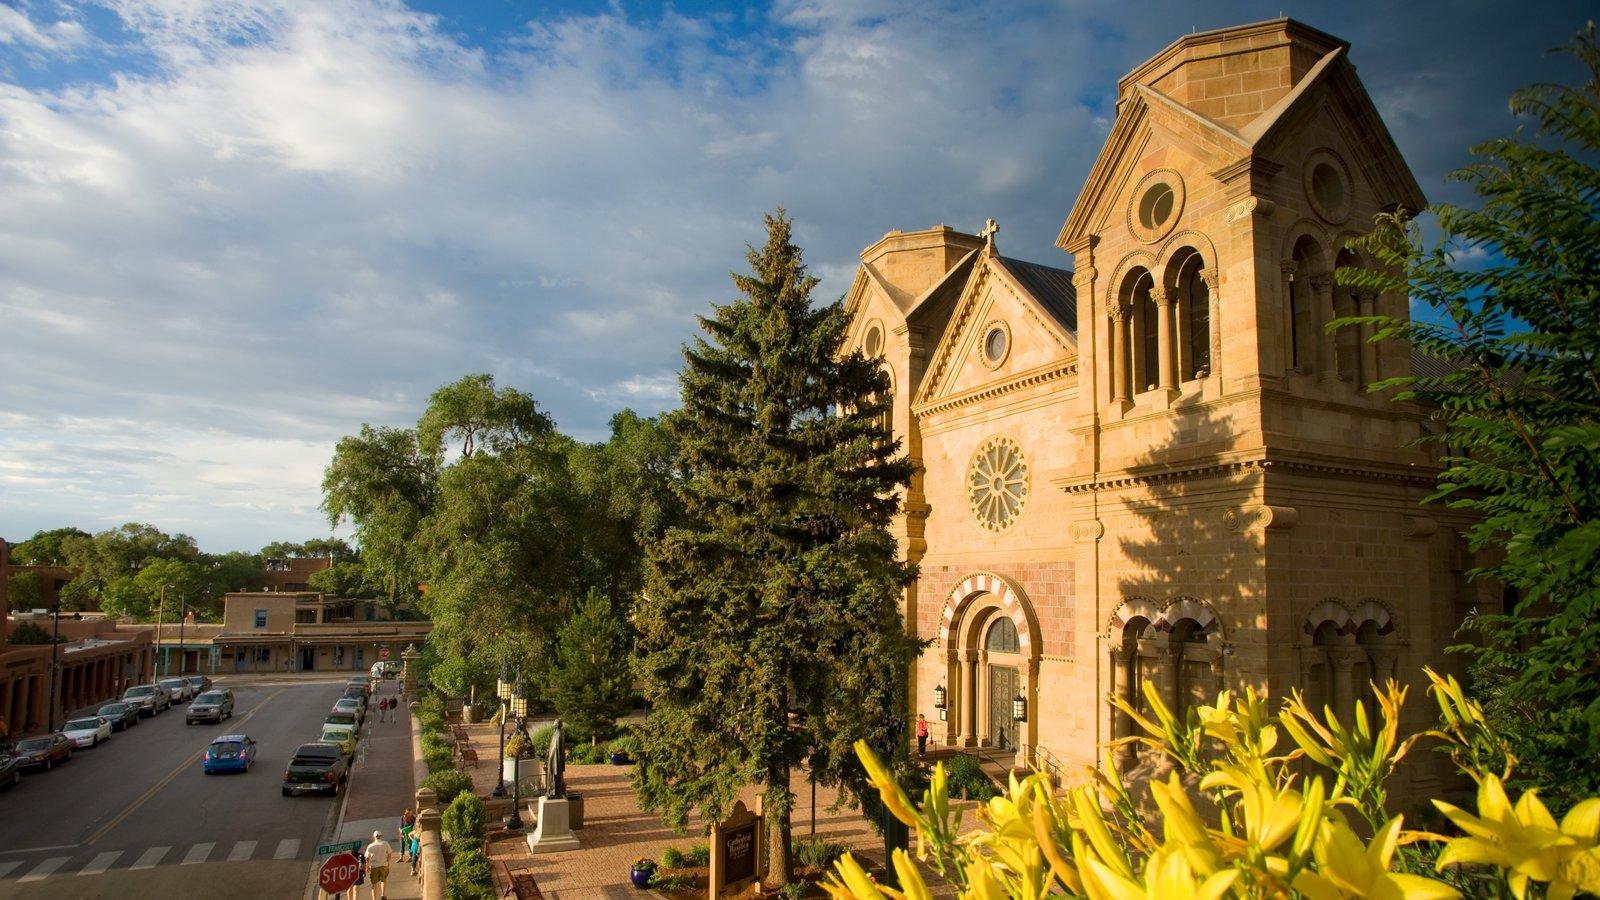 Cathedral Basilica of Saint Francis of Assisi que incluye una iglesia o catedral, aspectos religiosos y patrimonio de arquitectura